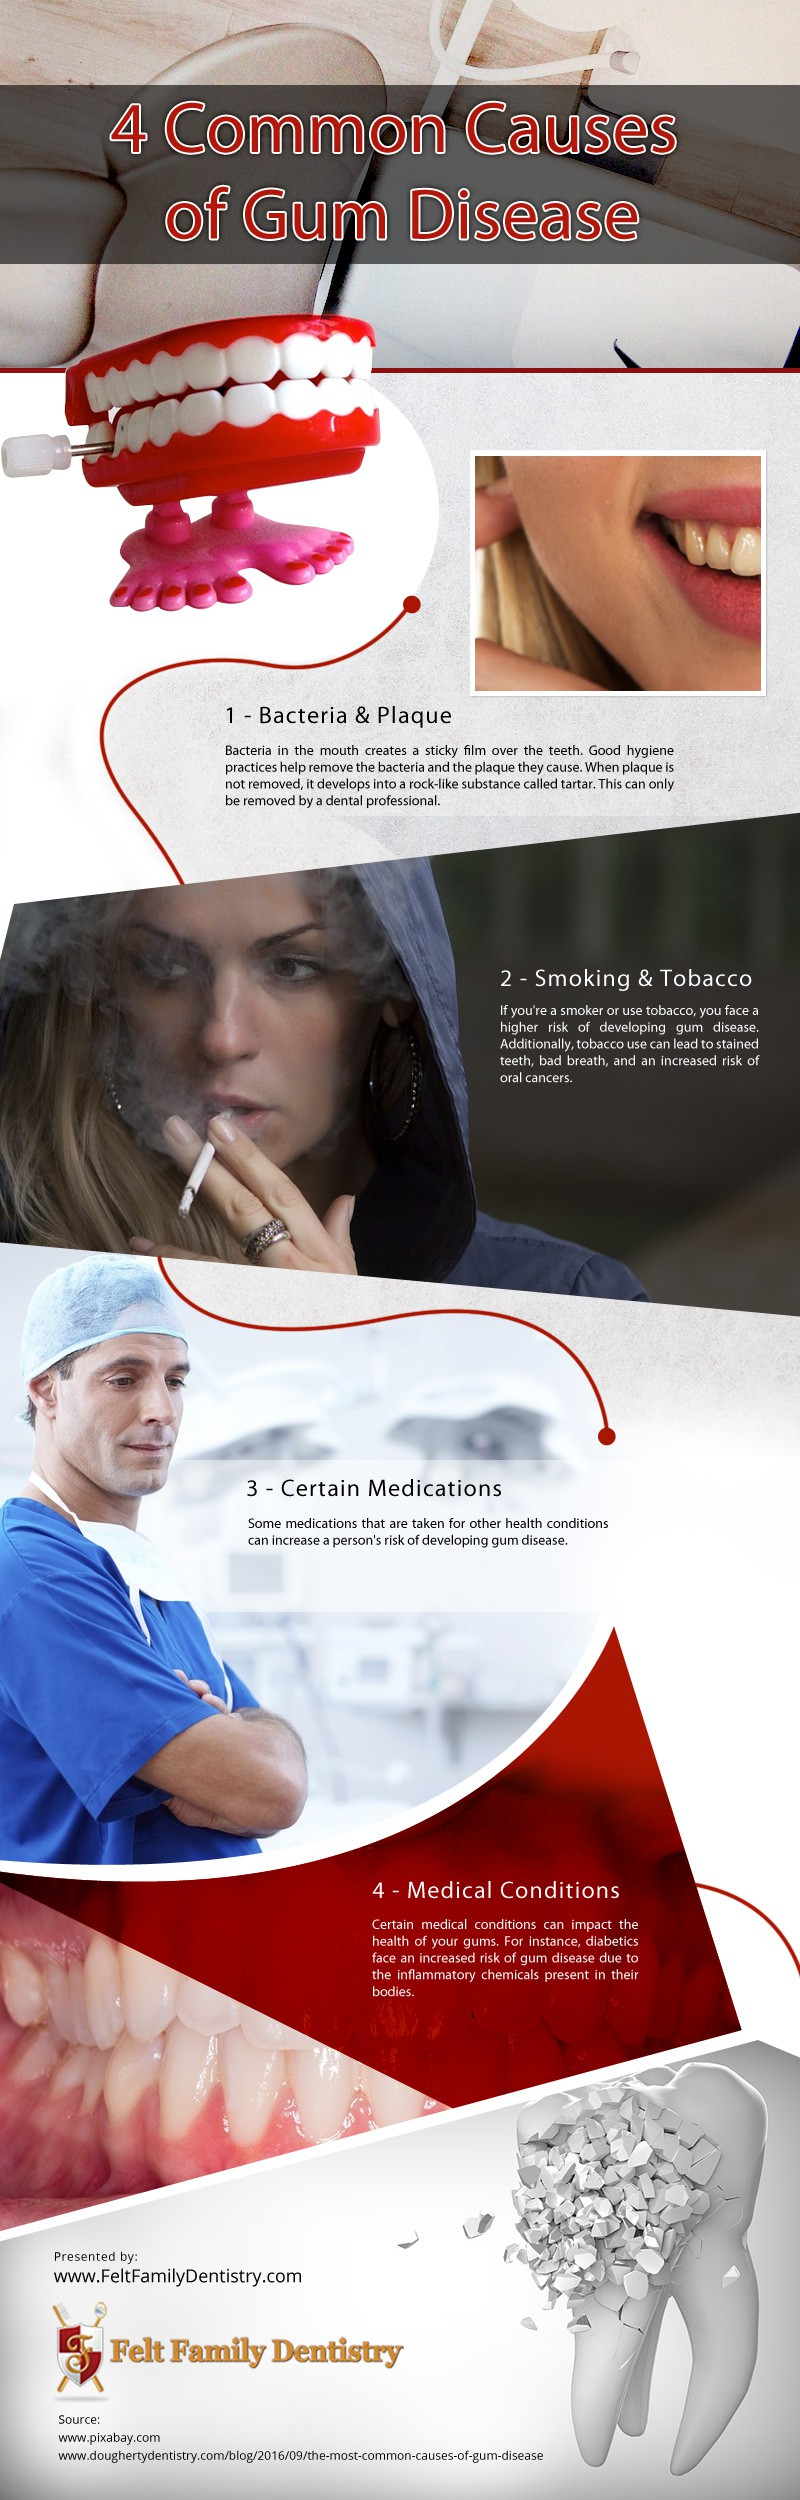 Common-Causes-of-Gum-Disease Infographic